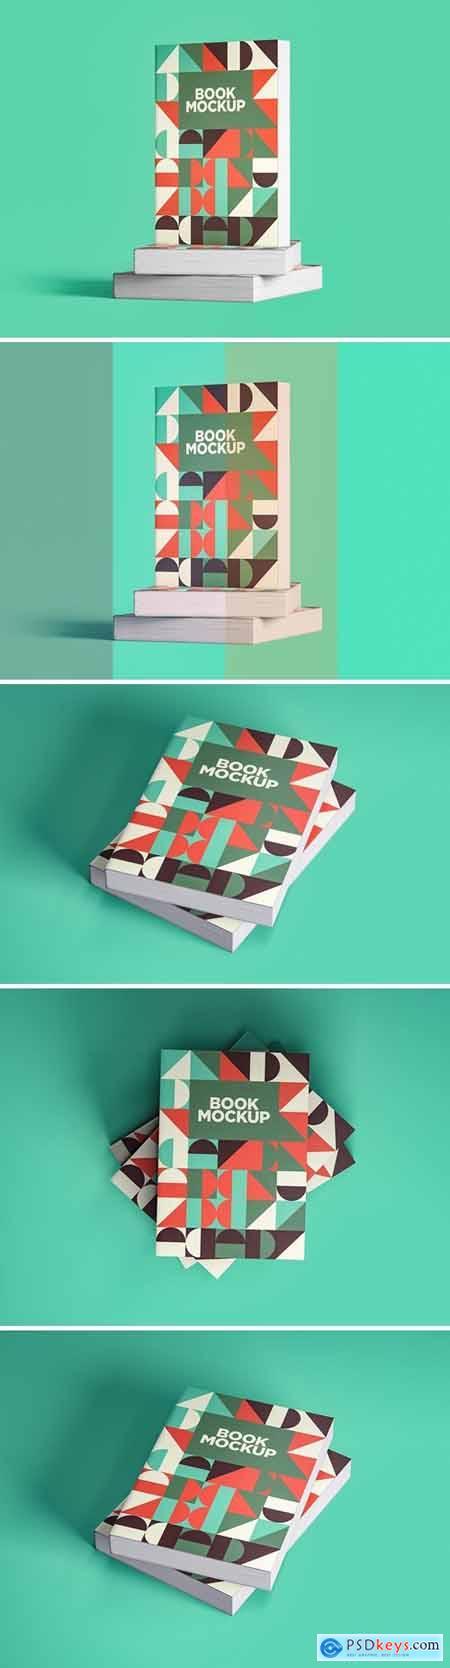 Book Mockups Pack